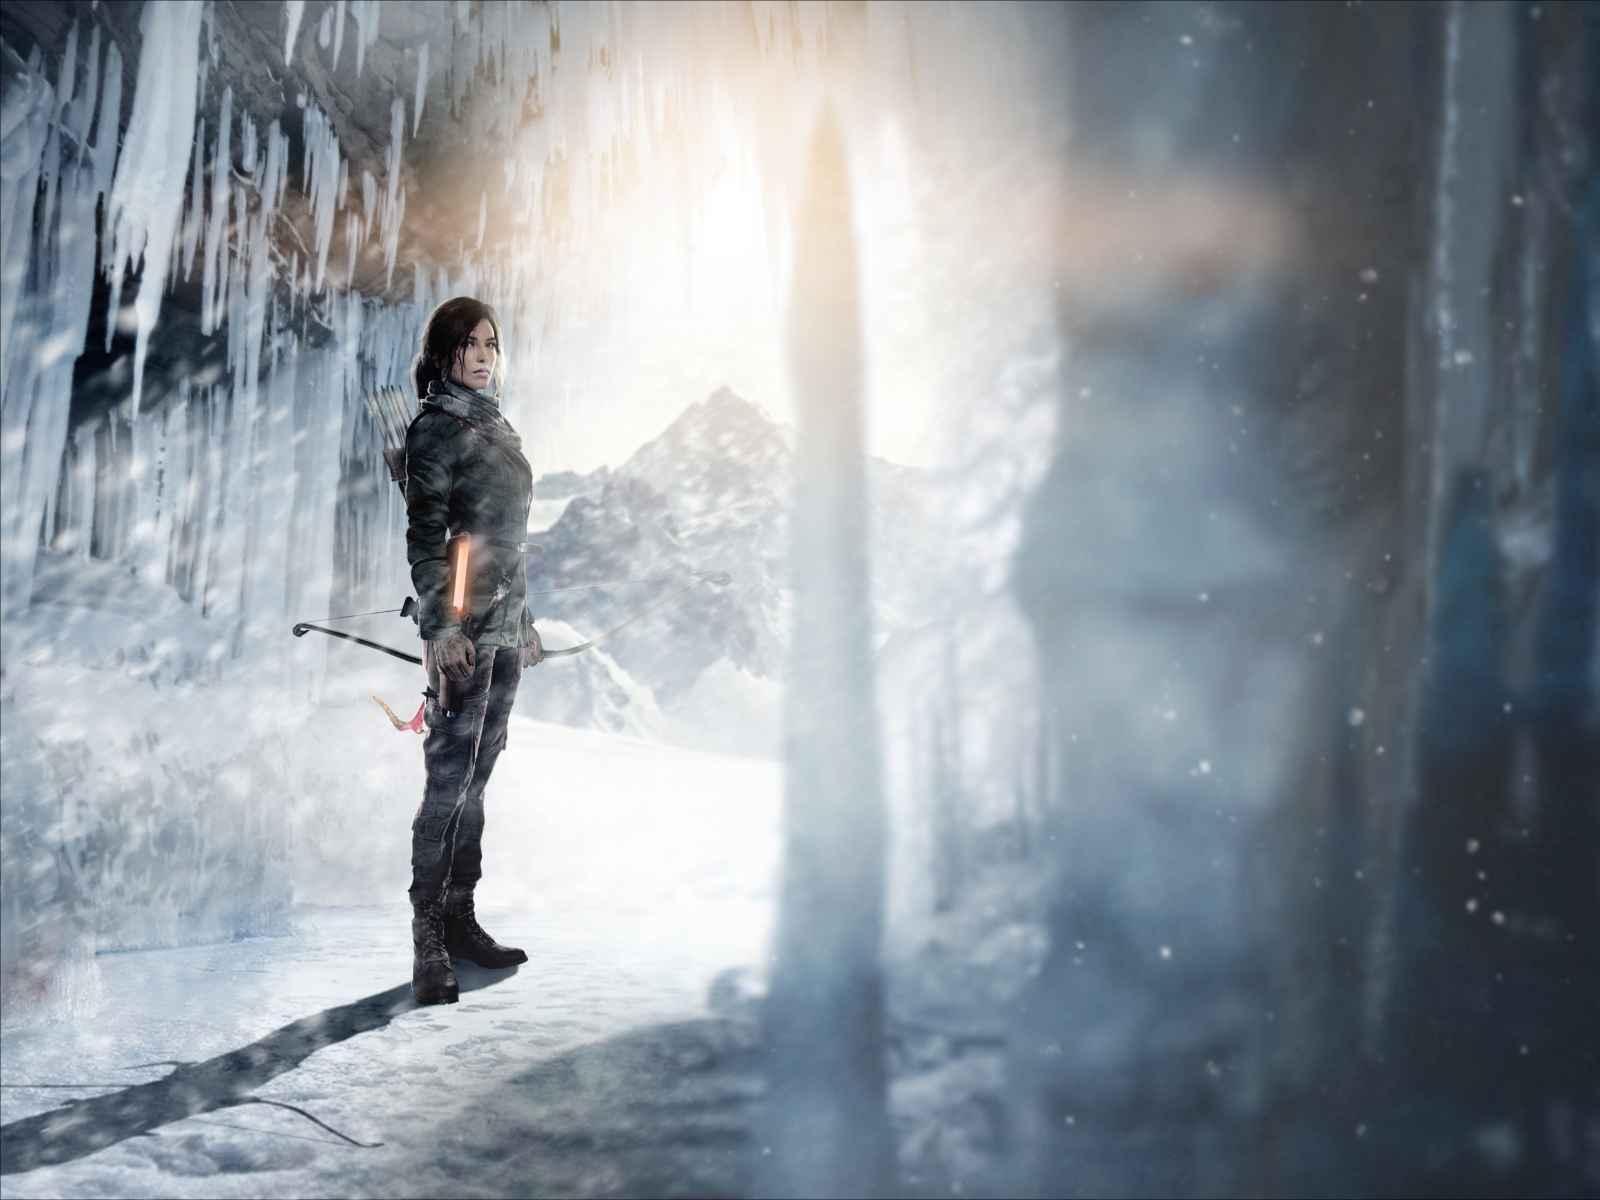 Tomb raider, Lara croft, Rise of the tomb raider 1600×1200 HD Background